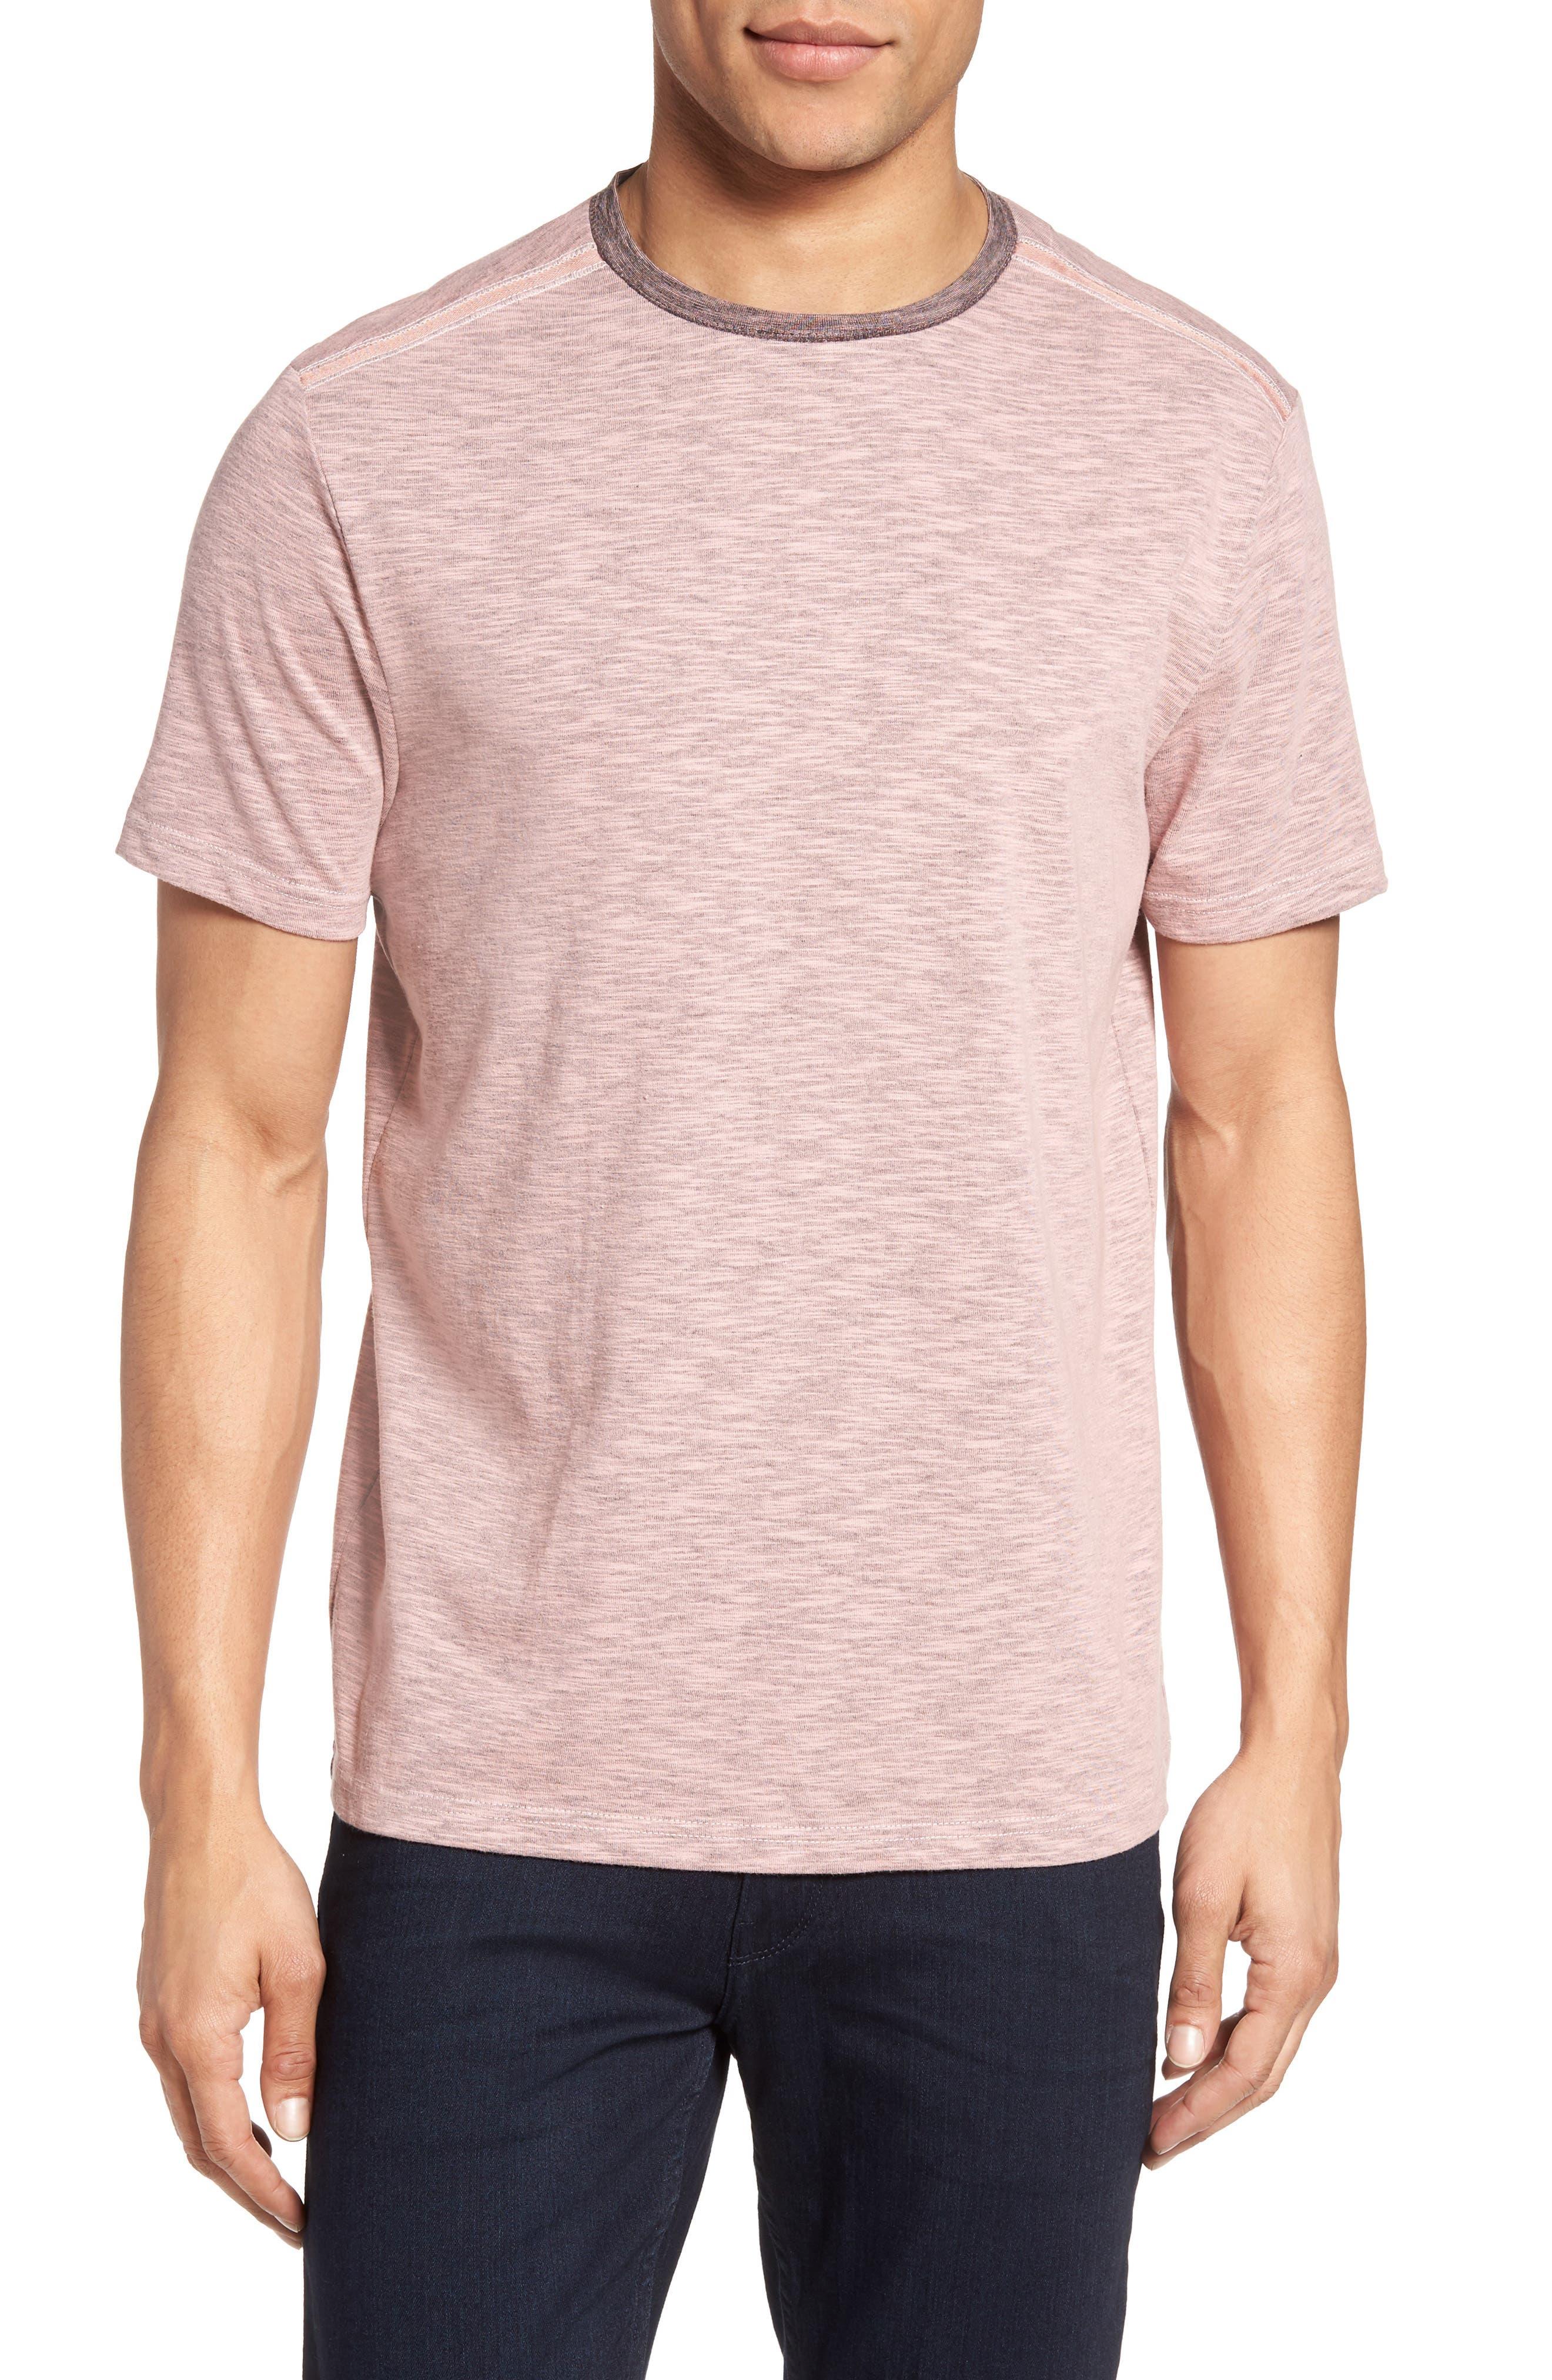 Alternate Image 1 Selected - Vince Camuto Ringer T-Shirt